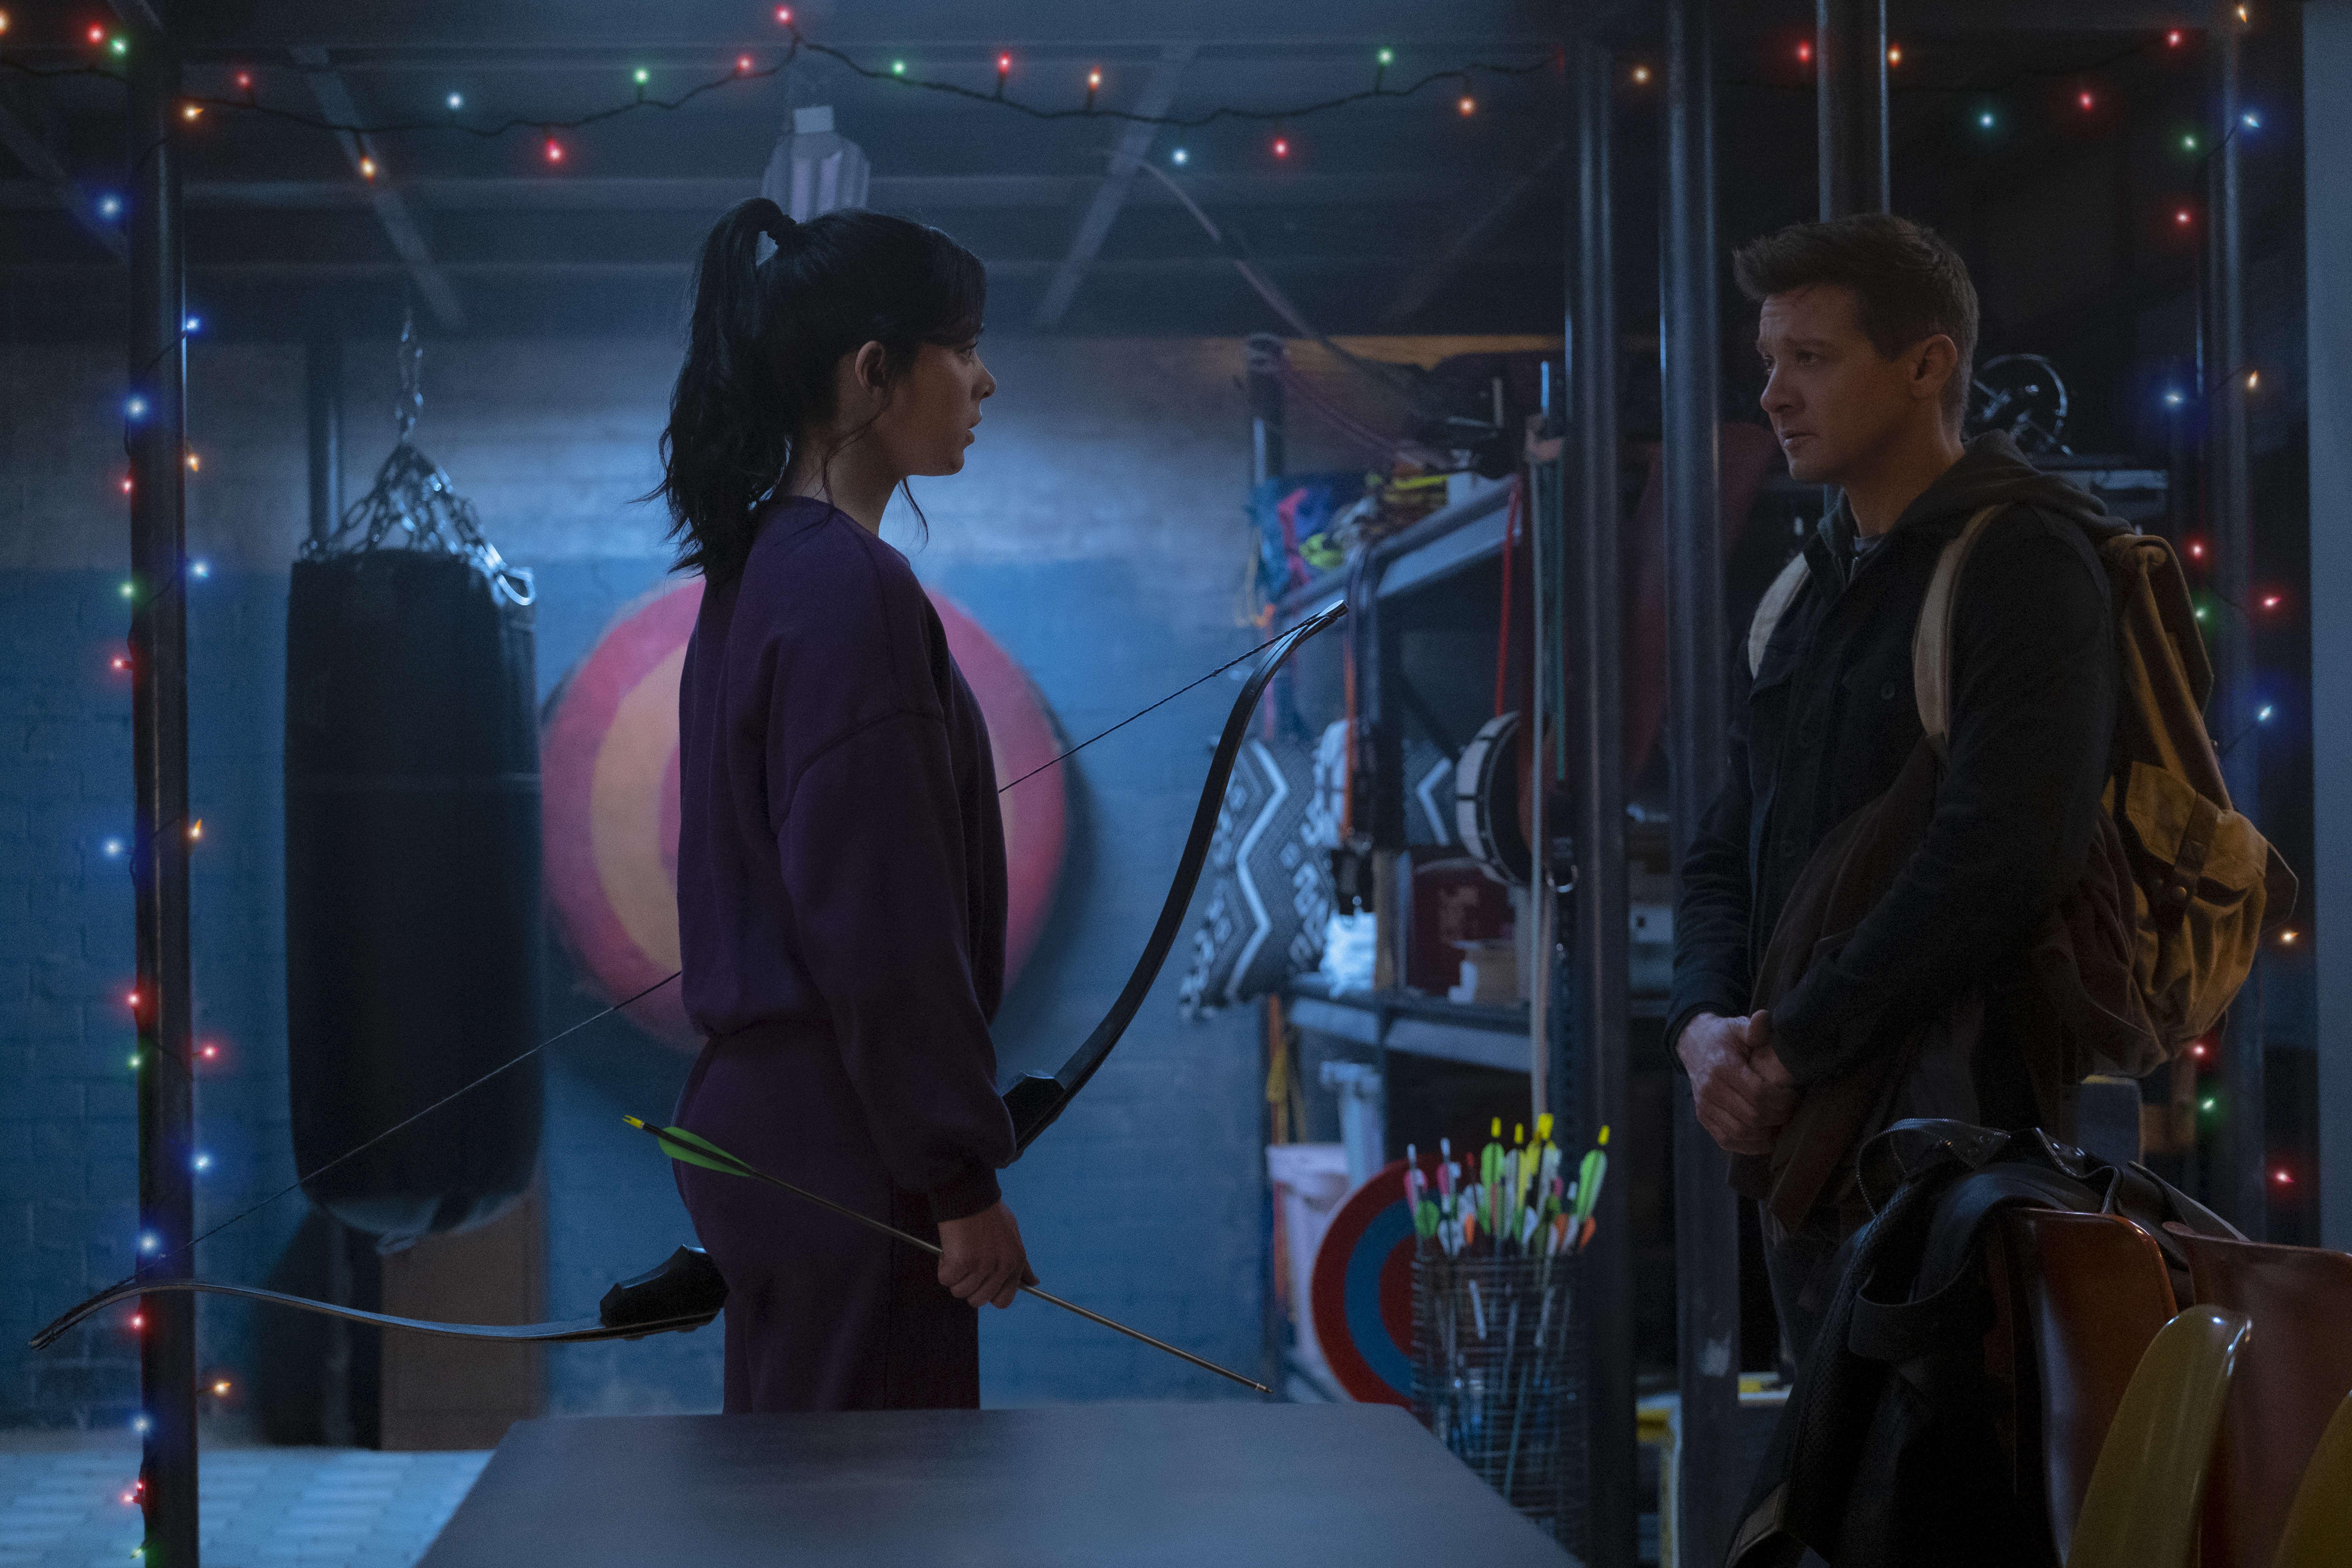 Marvel's 'Hawkeye' series takes aim at November premiere on Disney+, first pic reveals Kate Bishop